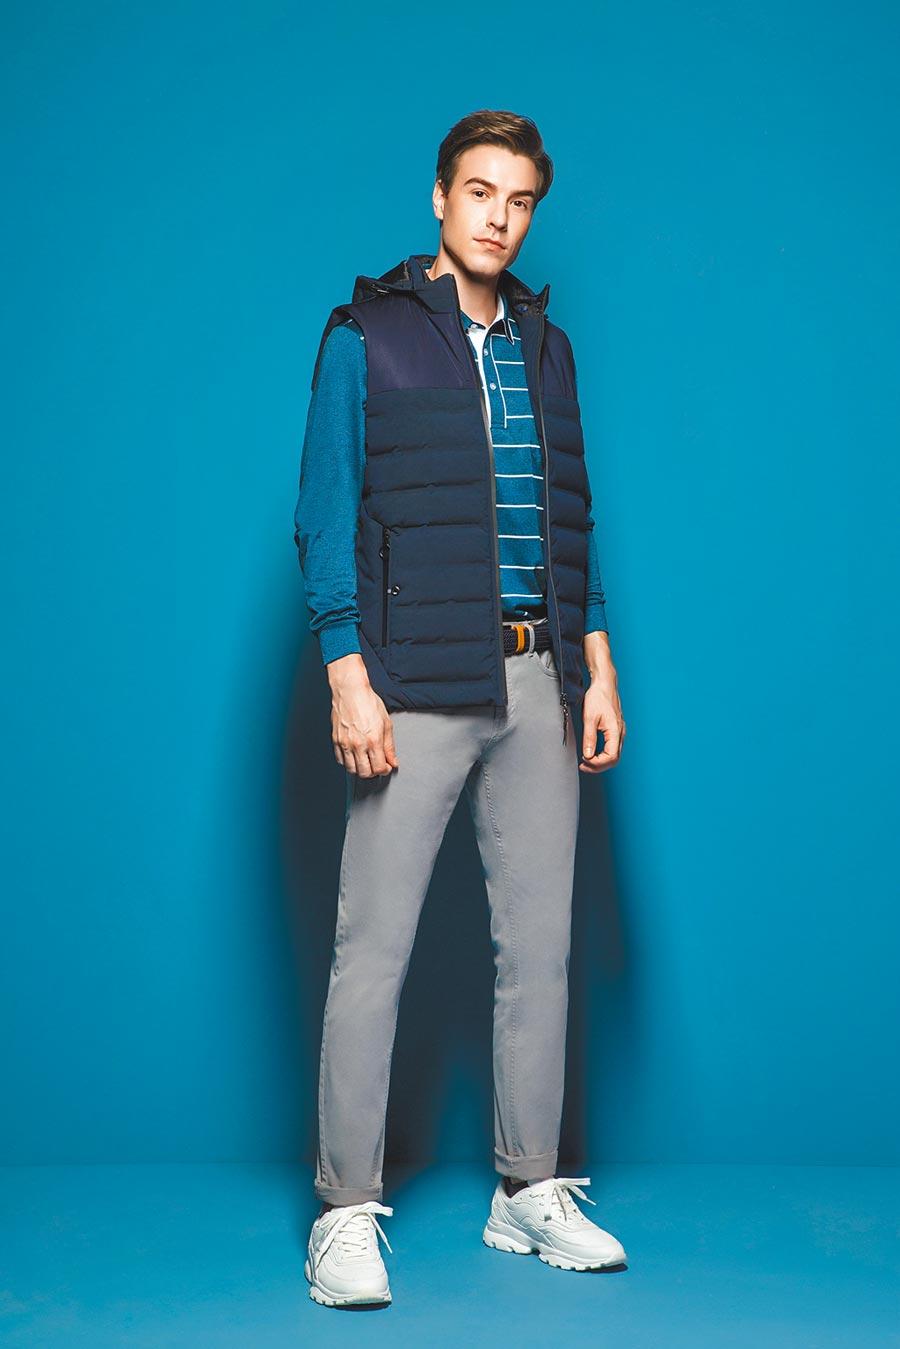 MONTAGUT法式休閒服,周年慶首7日全面7折,精選POLO衫1件1680元、2件3000元。(MONTAGUT提供)